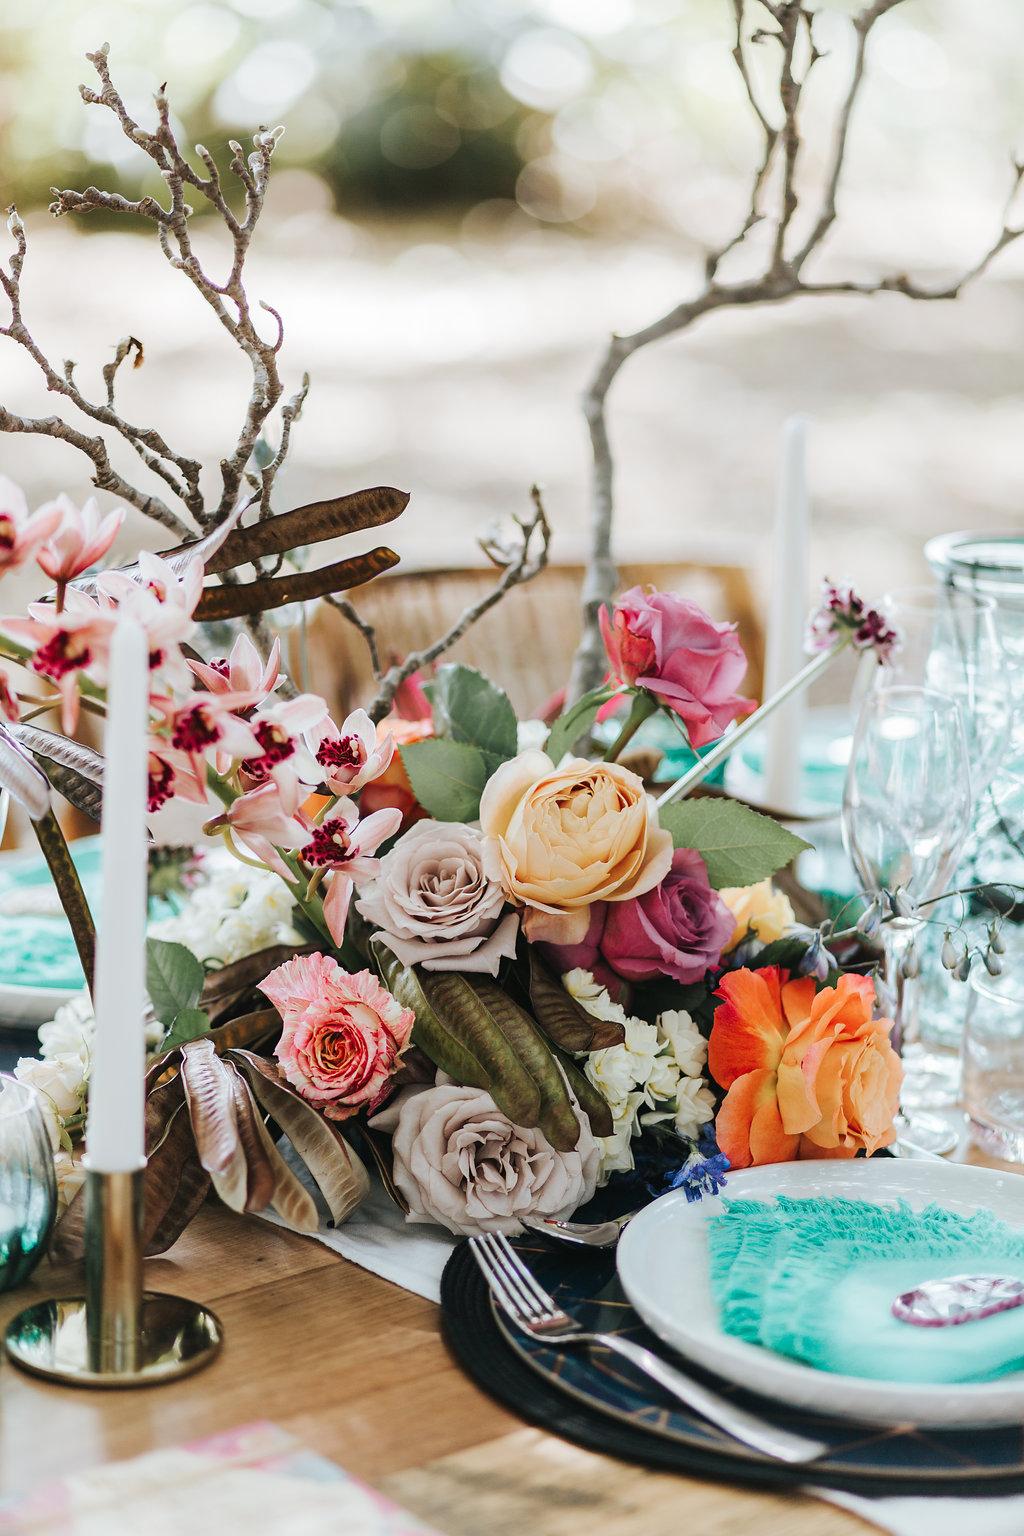 Bloodwood Botanica   Bohemian bright wedding table flowers